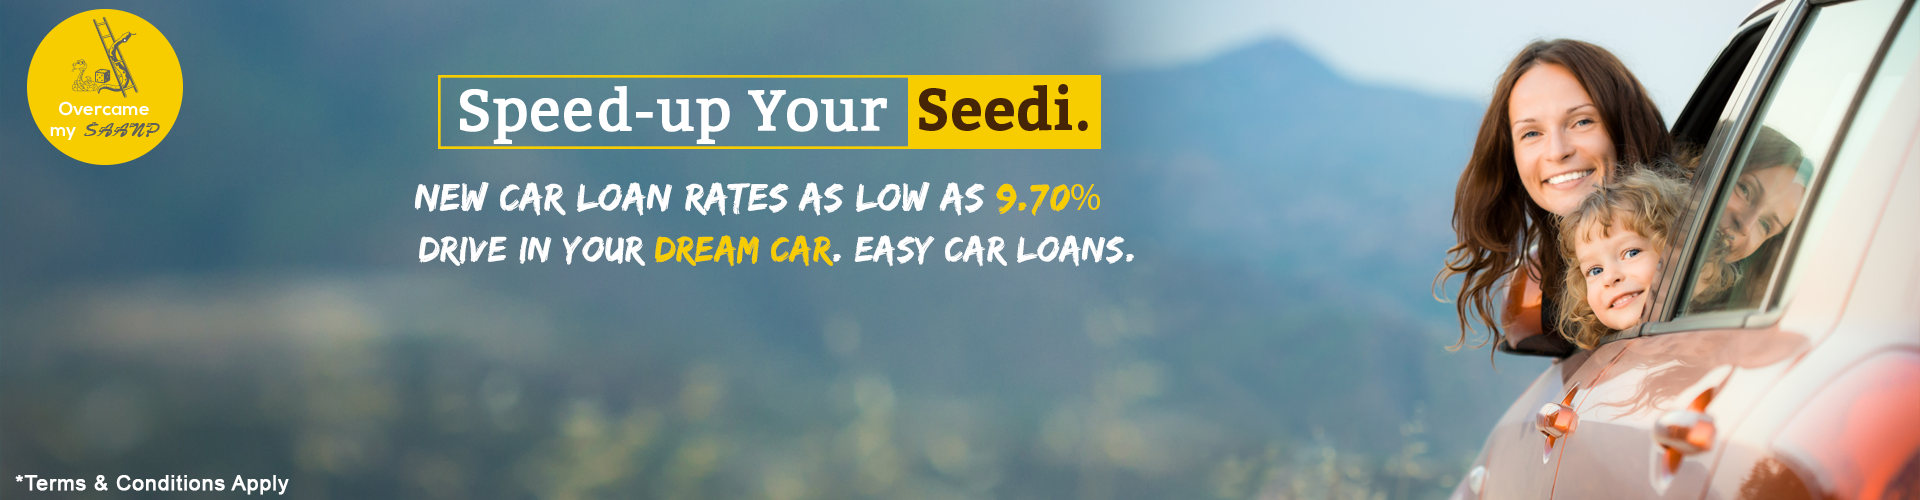 Auto Loan Slider